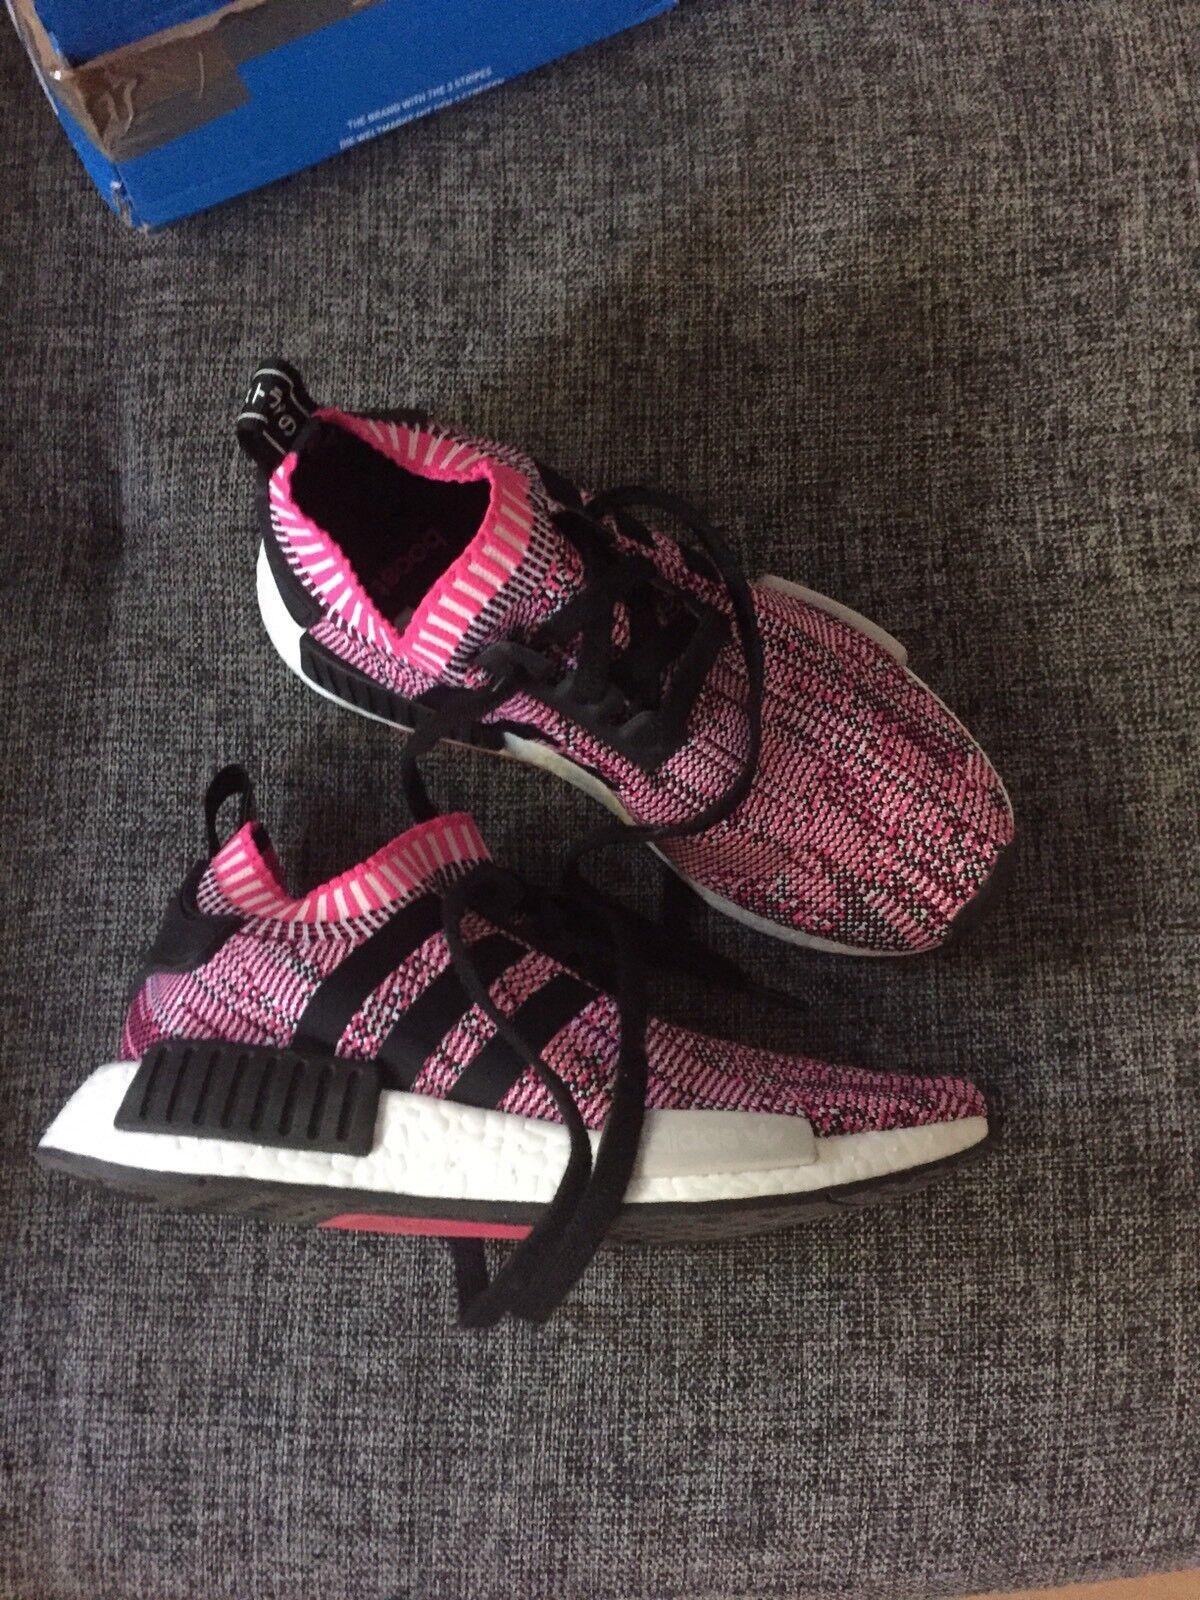 Neuwertige Adidas Sneakers / 38 Größe 38 / 2/3 9184df